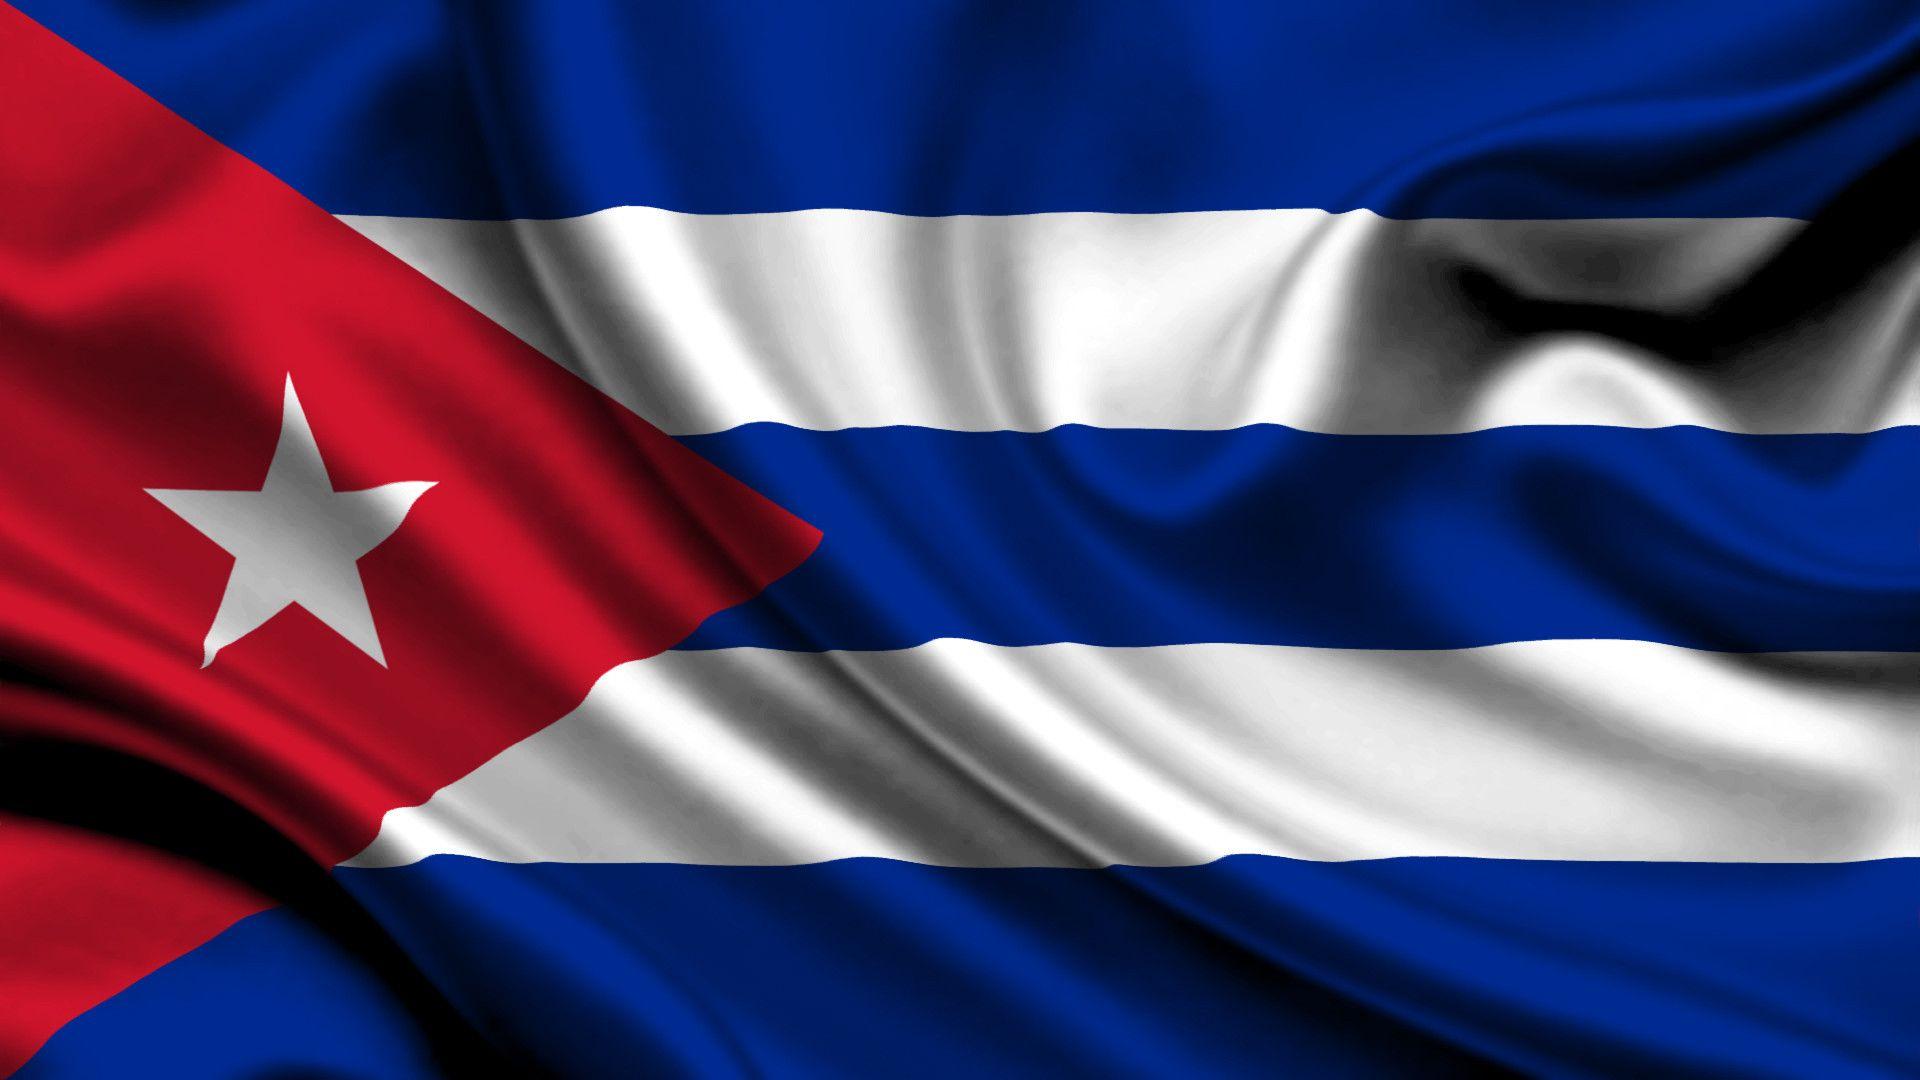 Cuba: US blockade remains main obstacle to island's development